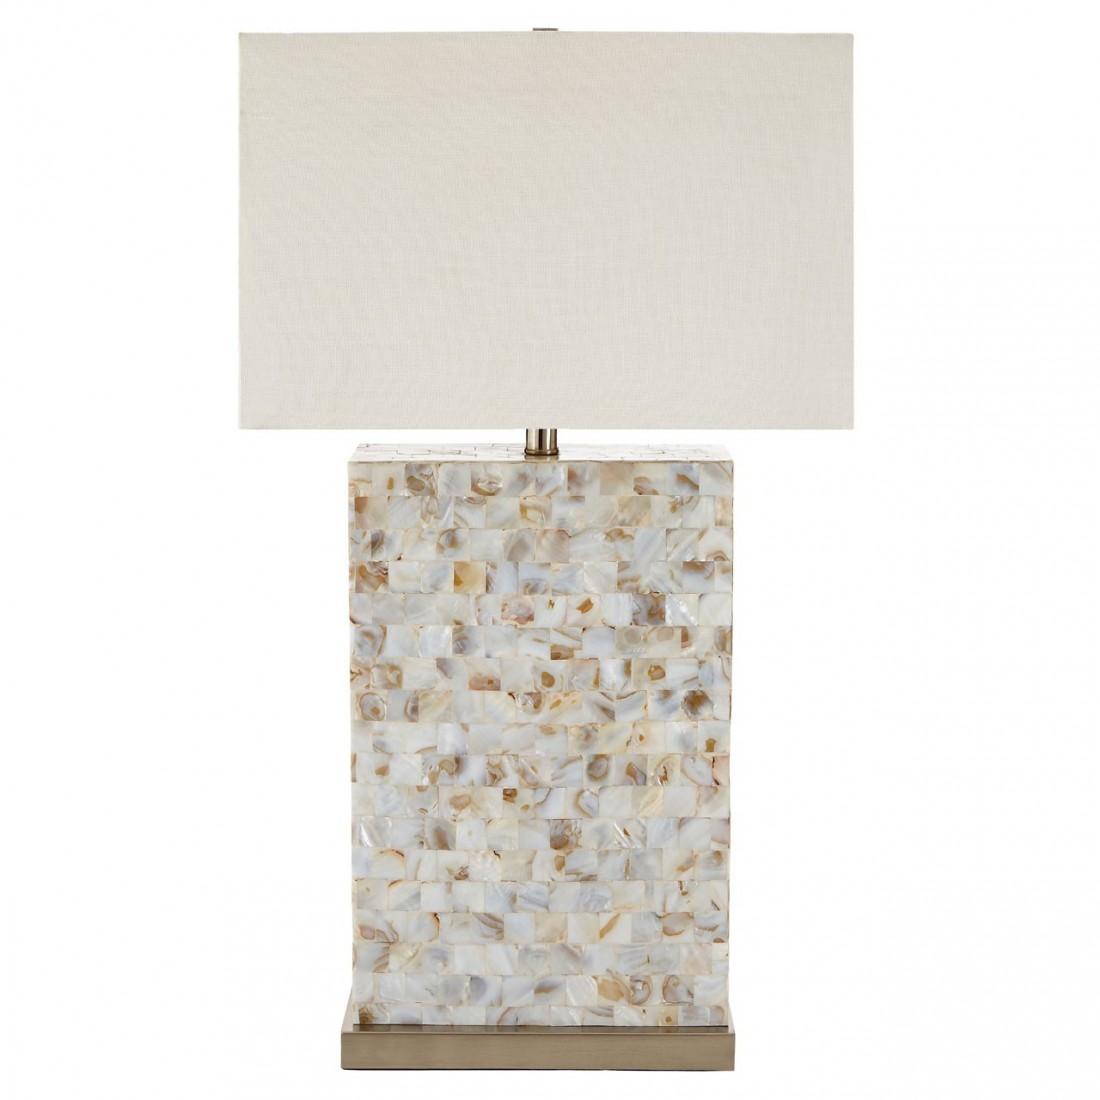 Kensington - Thermae Rect stolní lampa